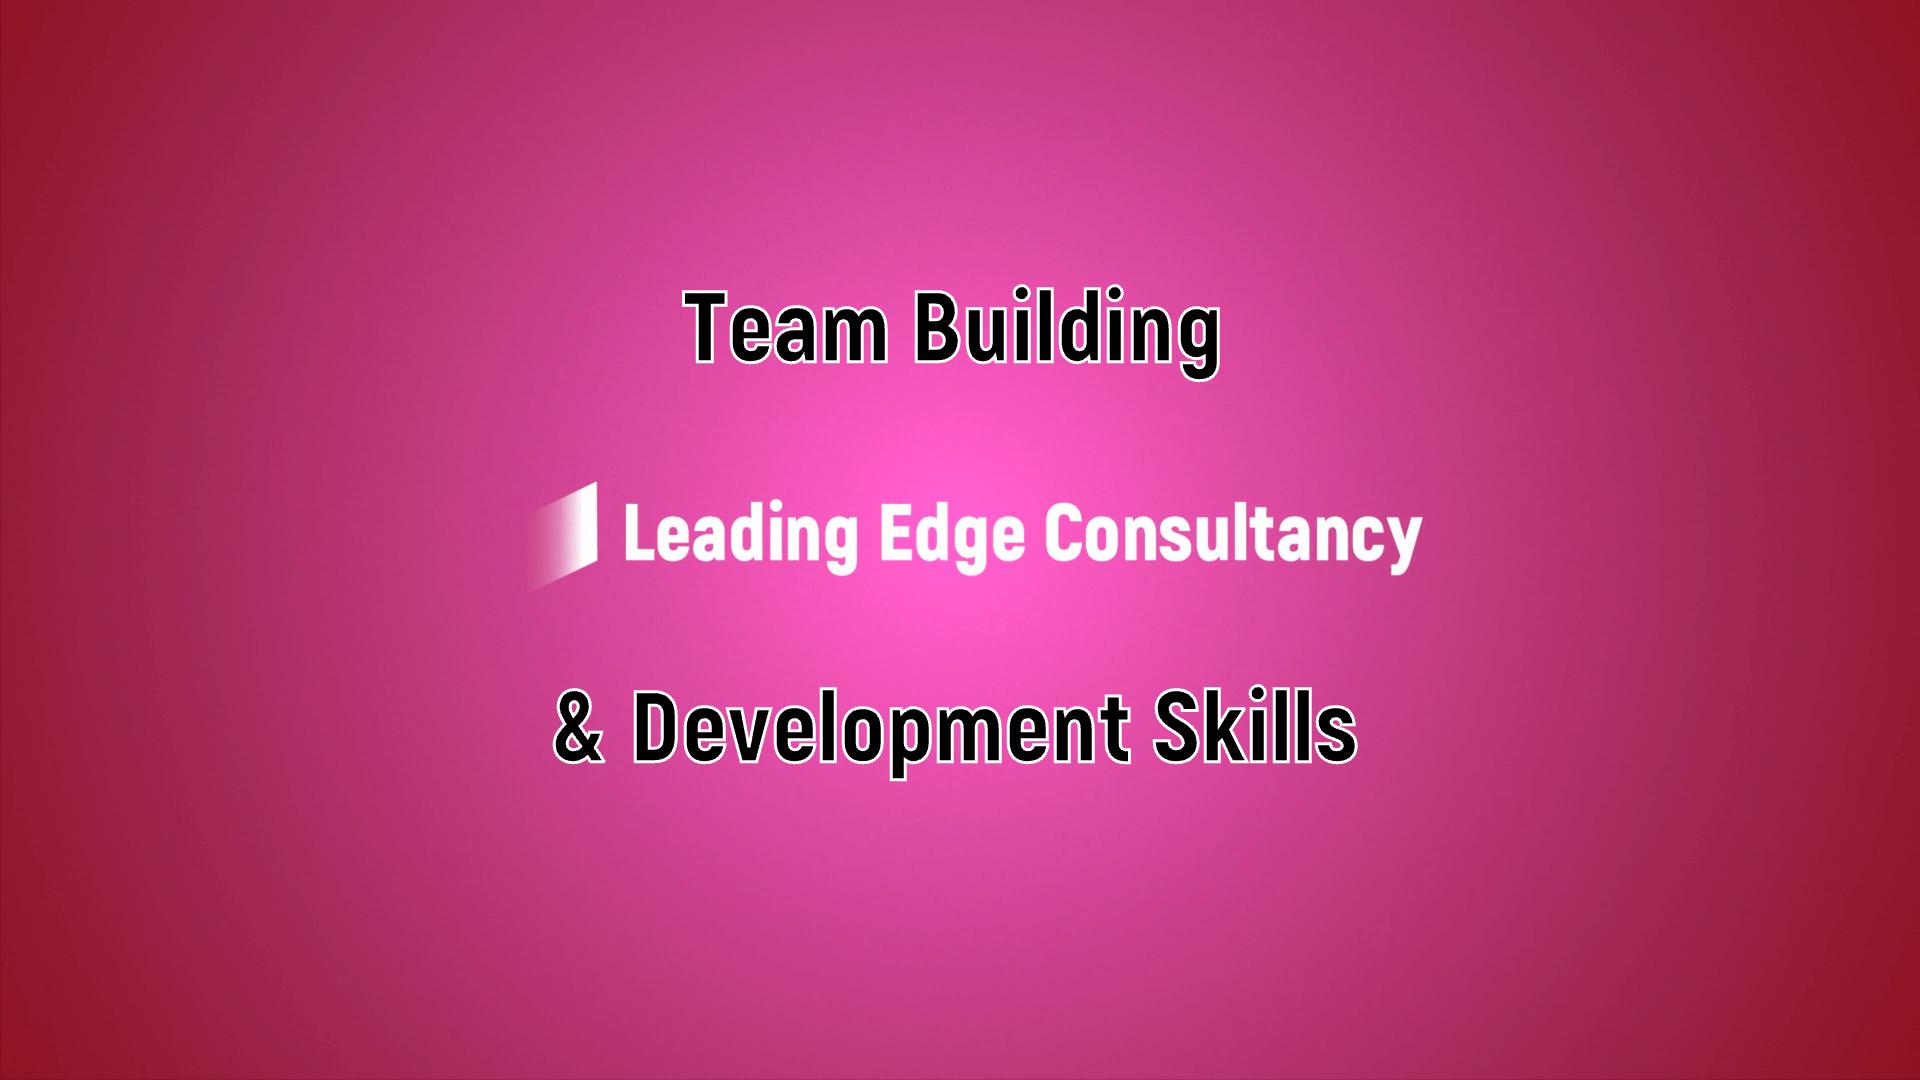 Team Building & Development